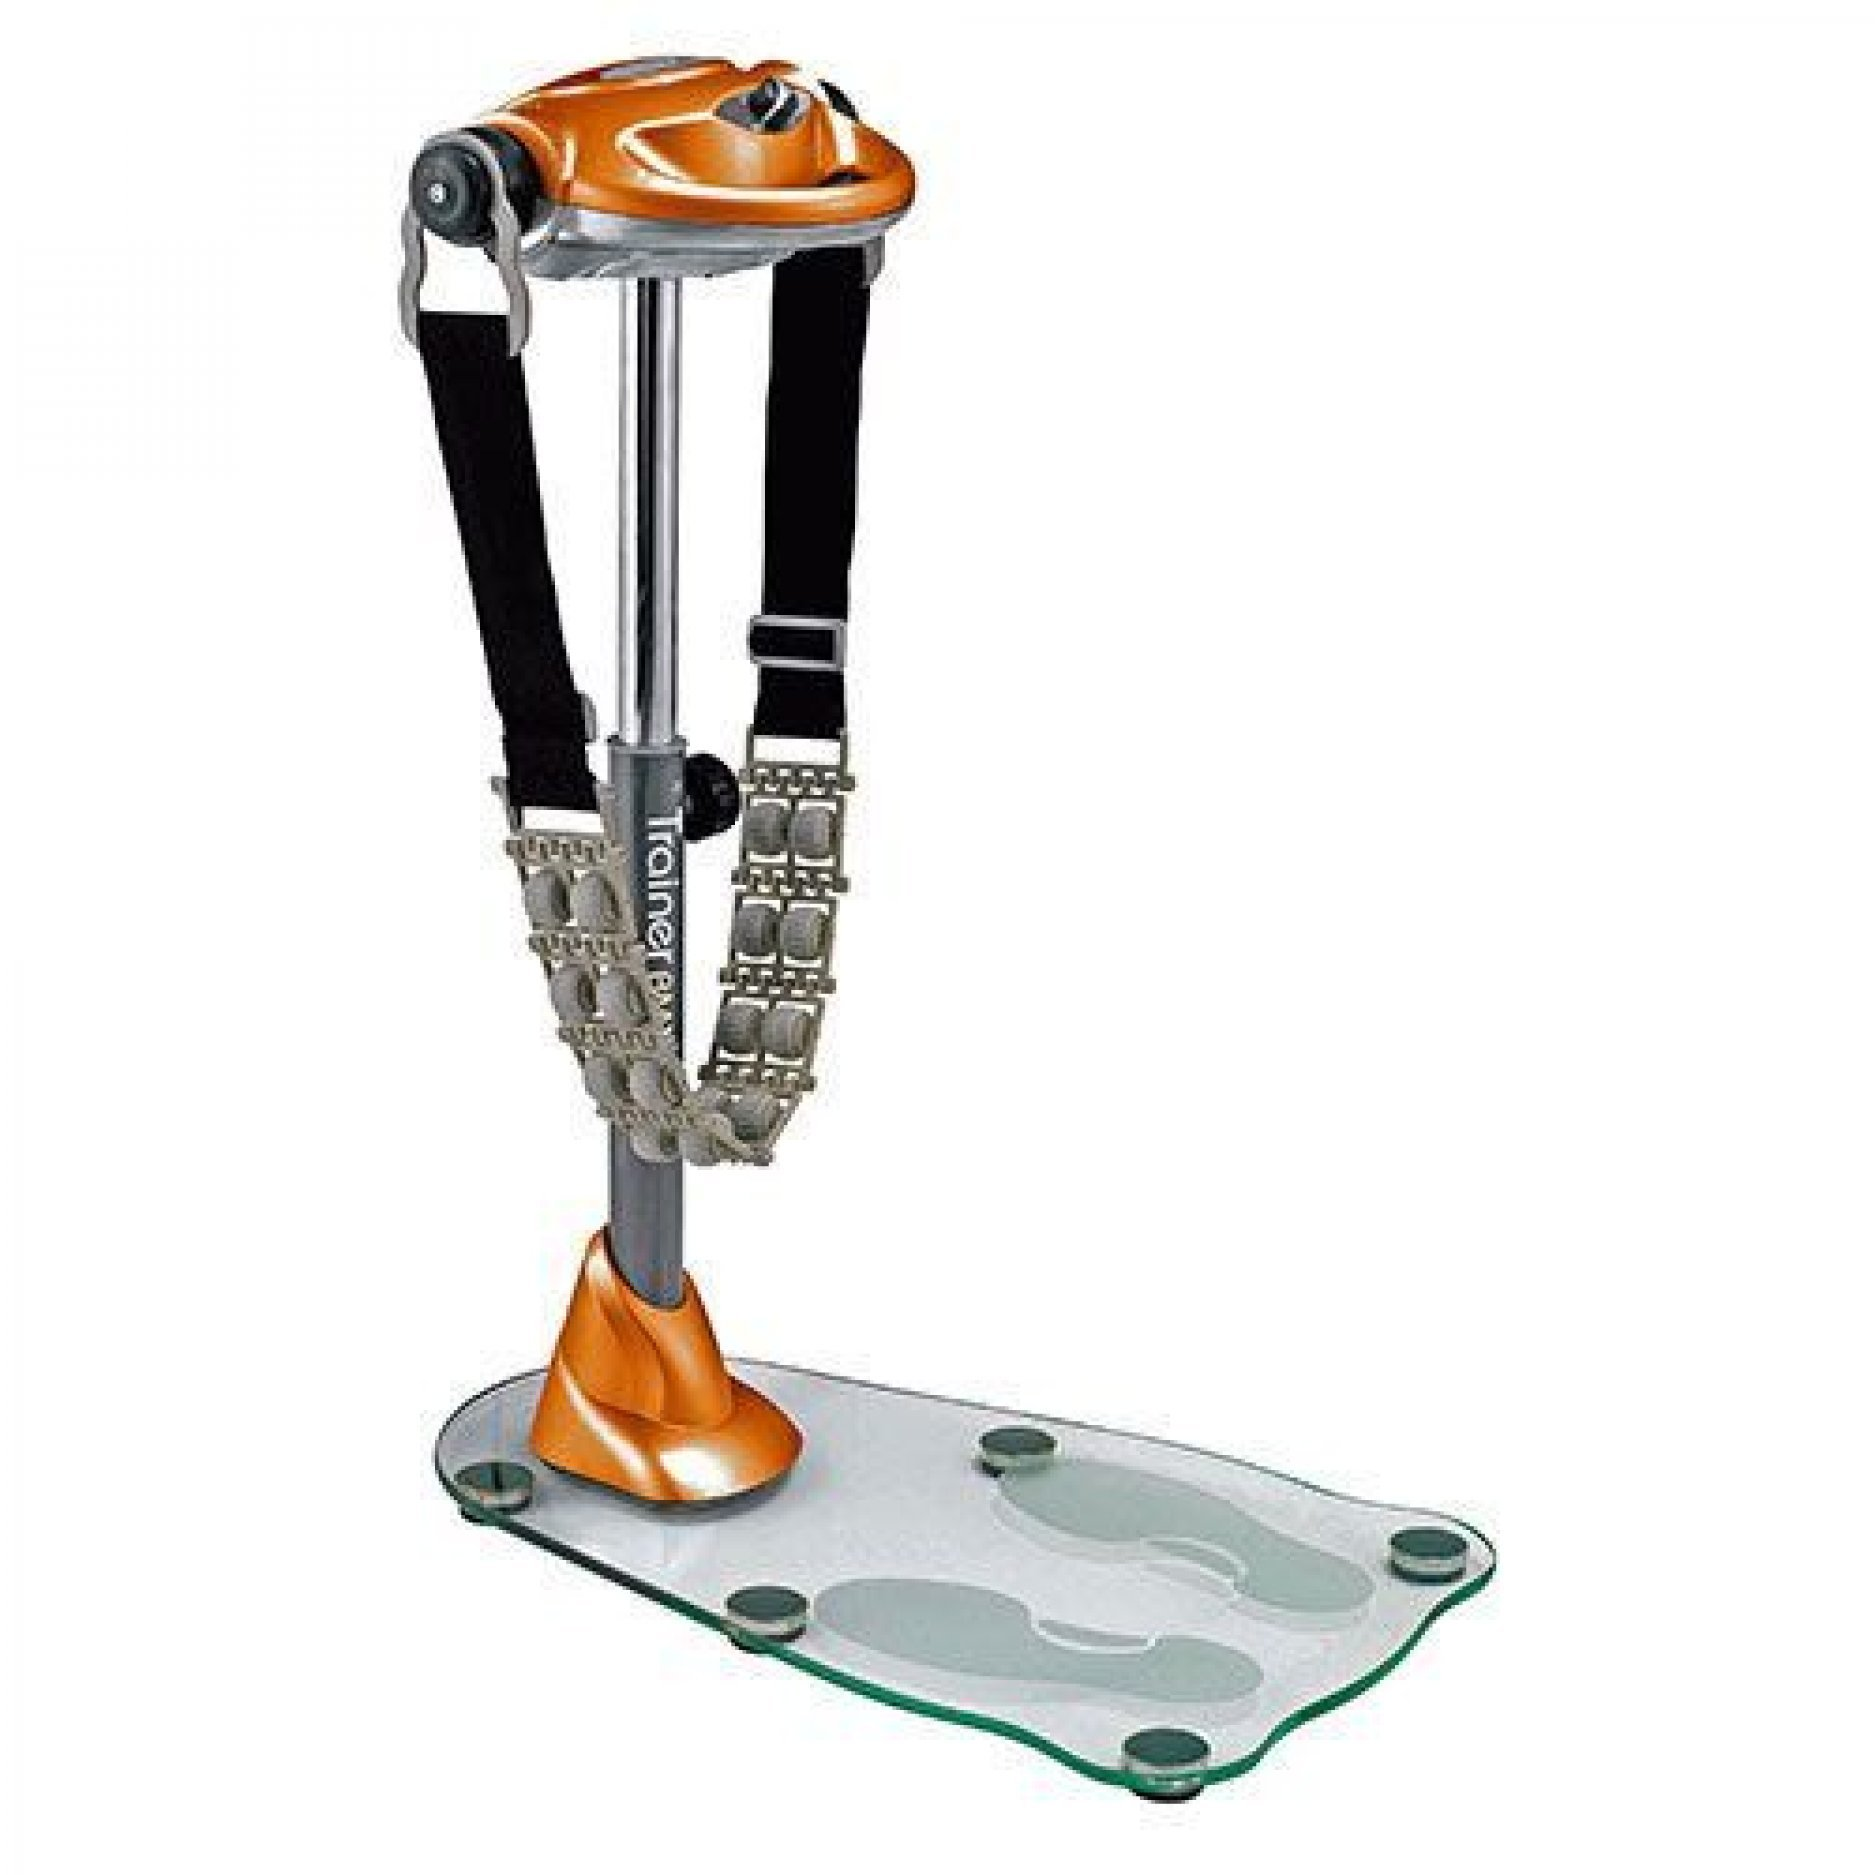 Электрический вибромассажер Body Sculpture ВМ-1200 GX-C